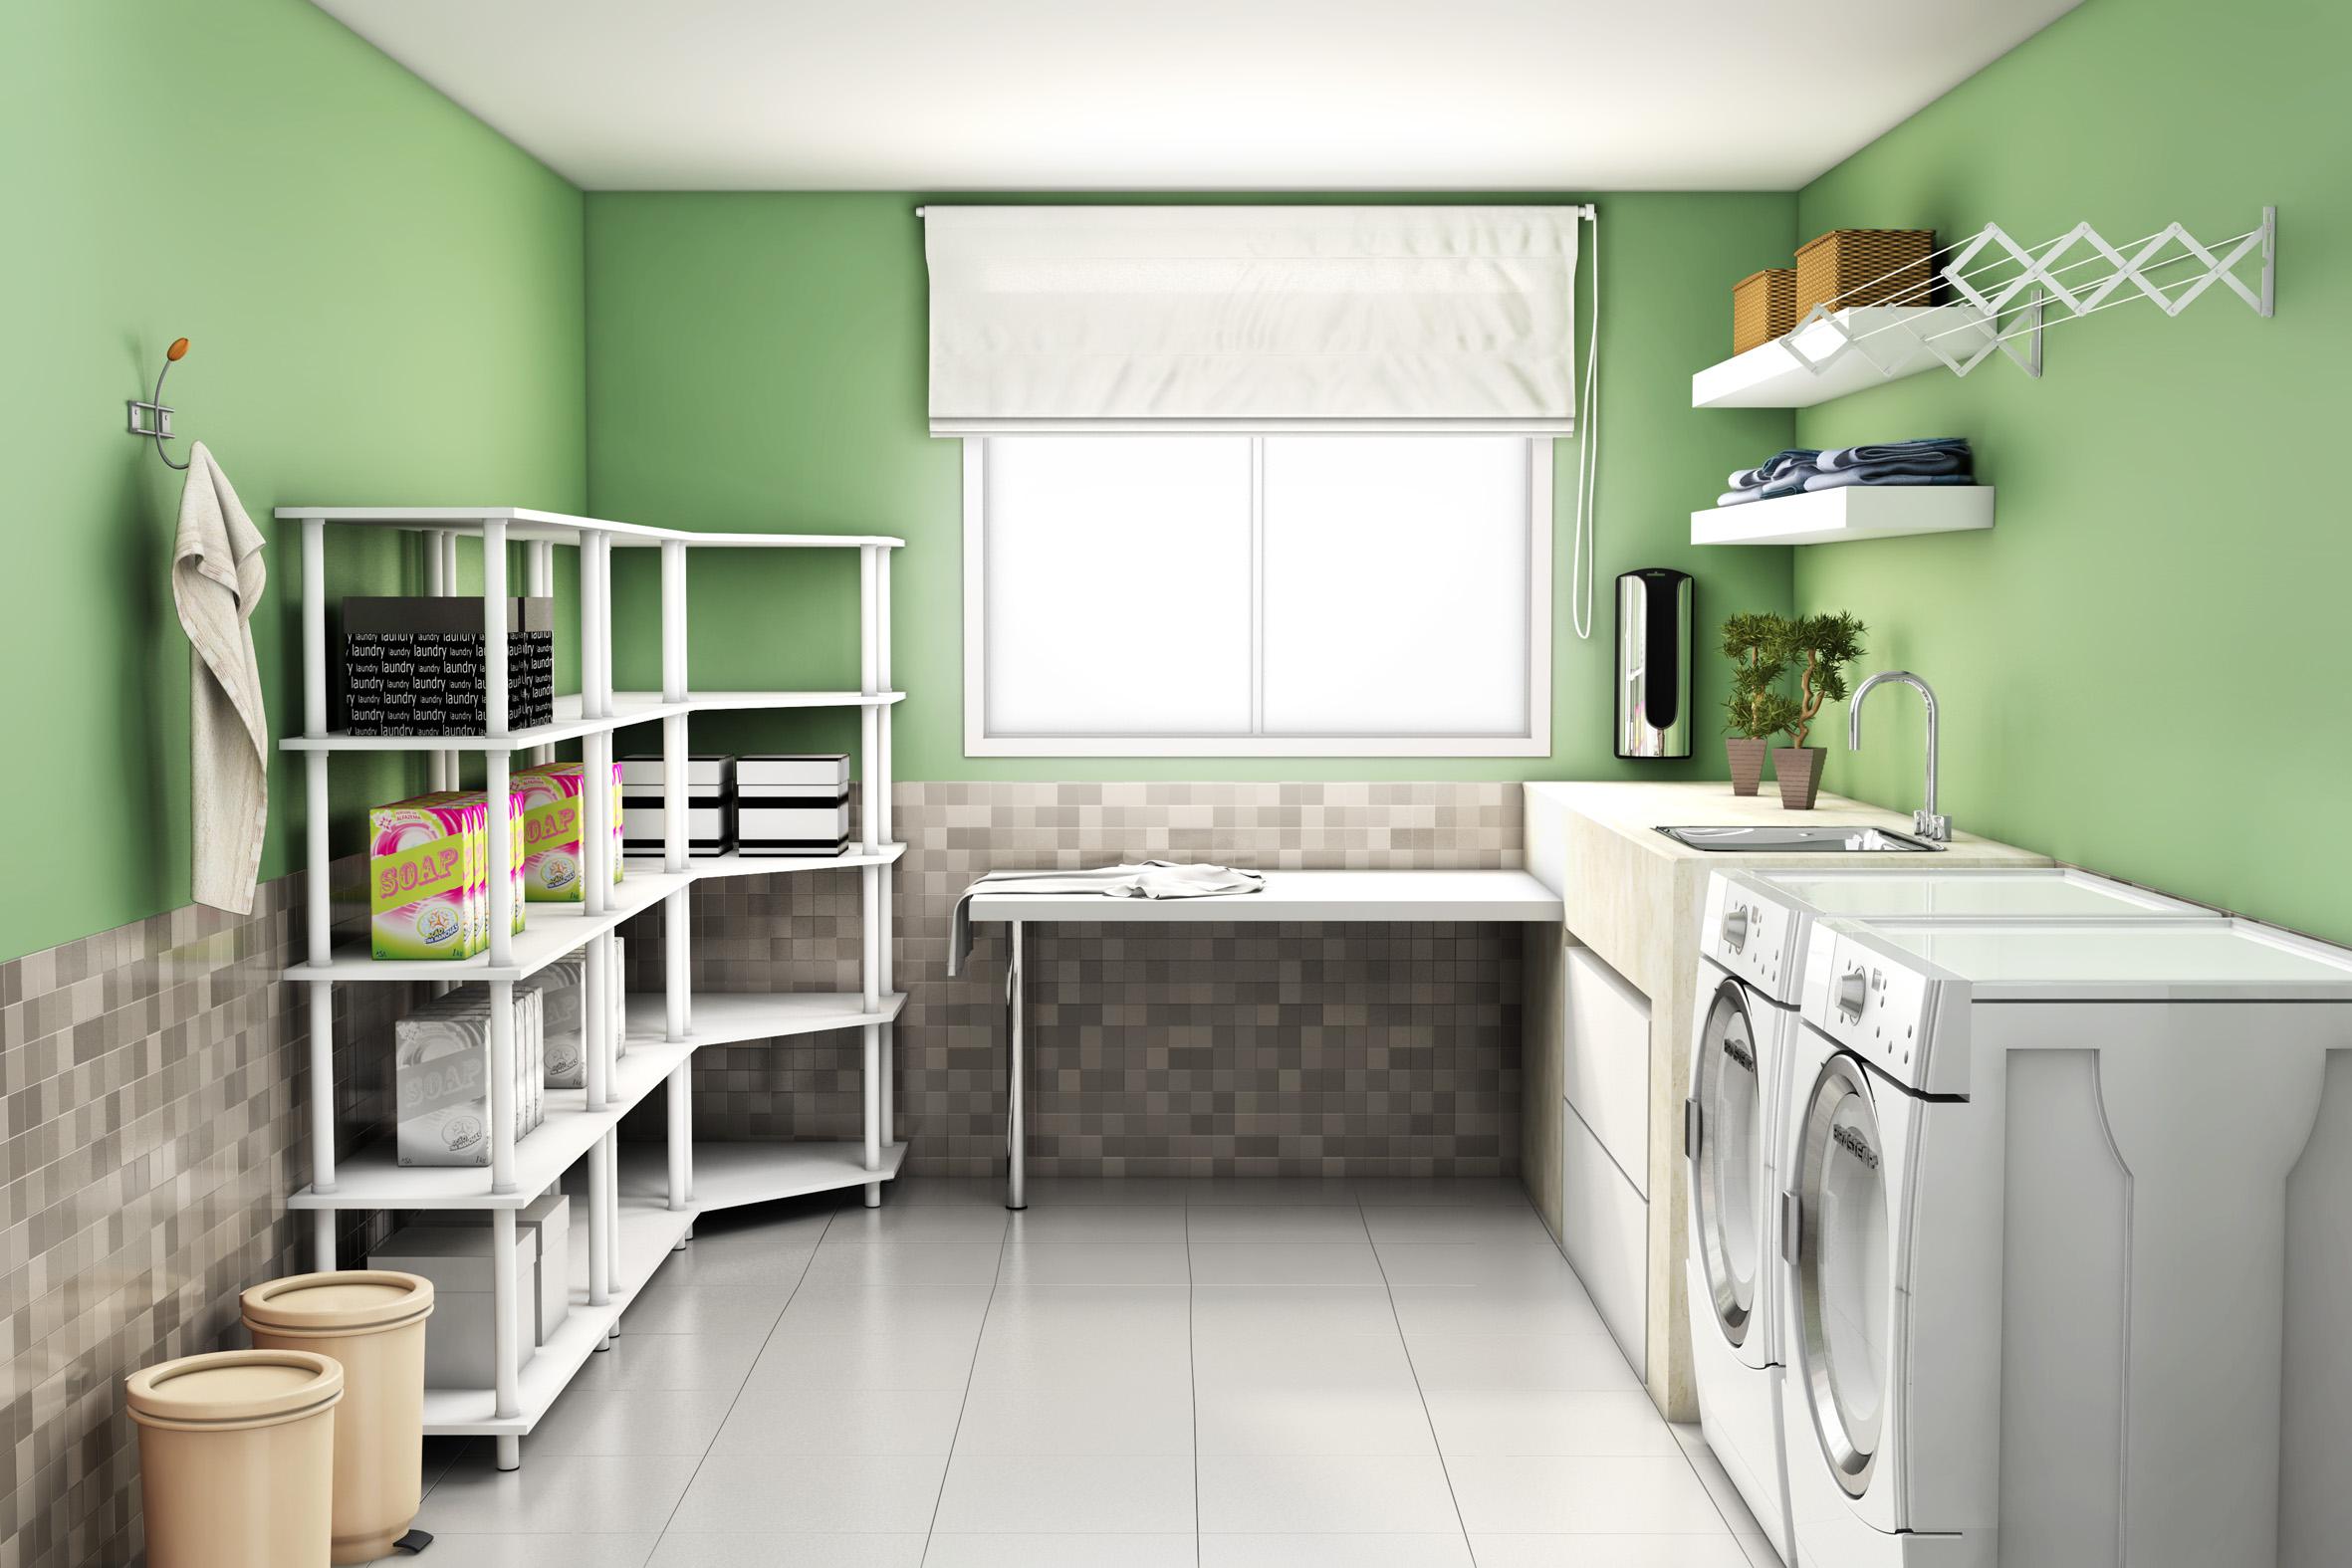 lavandaria Organiza